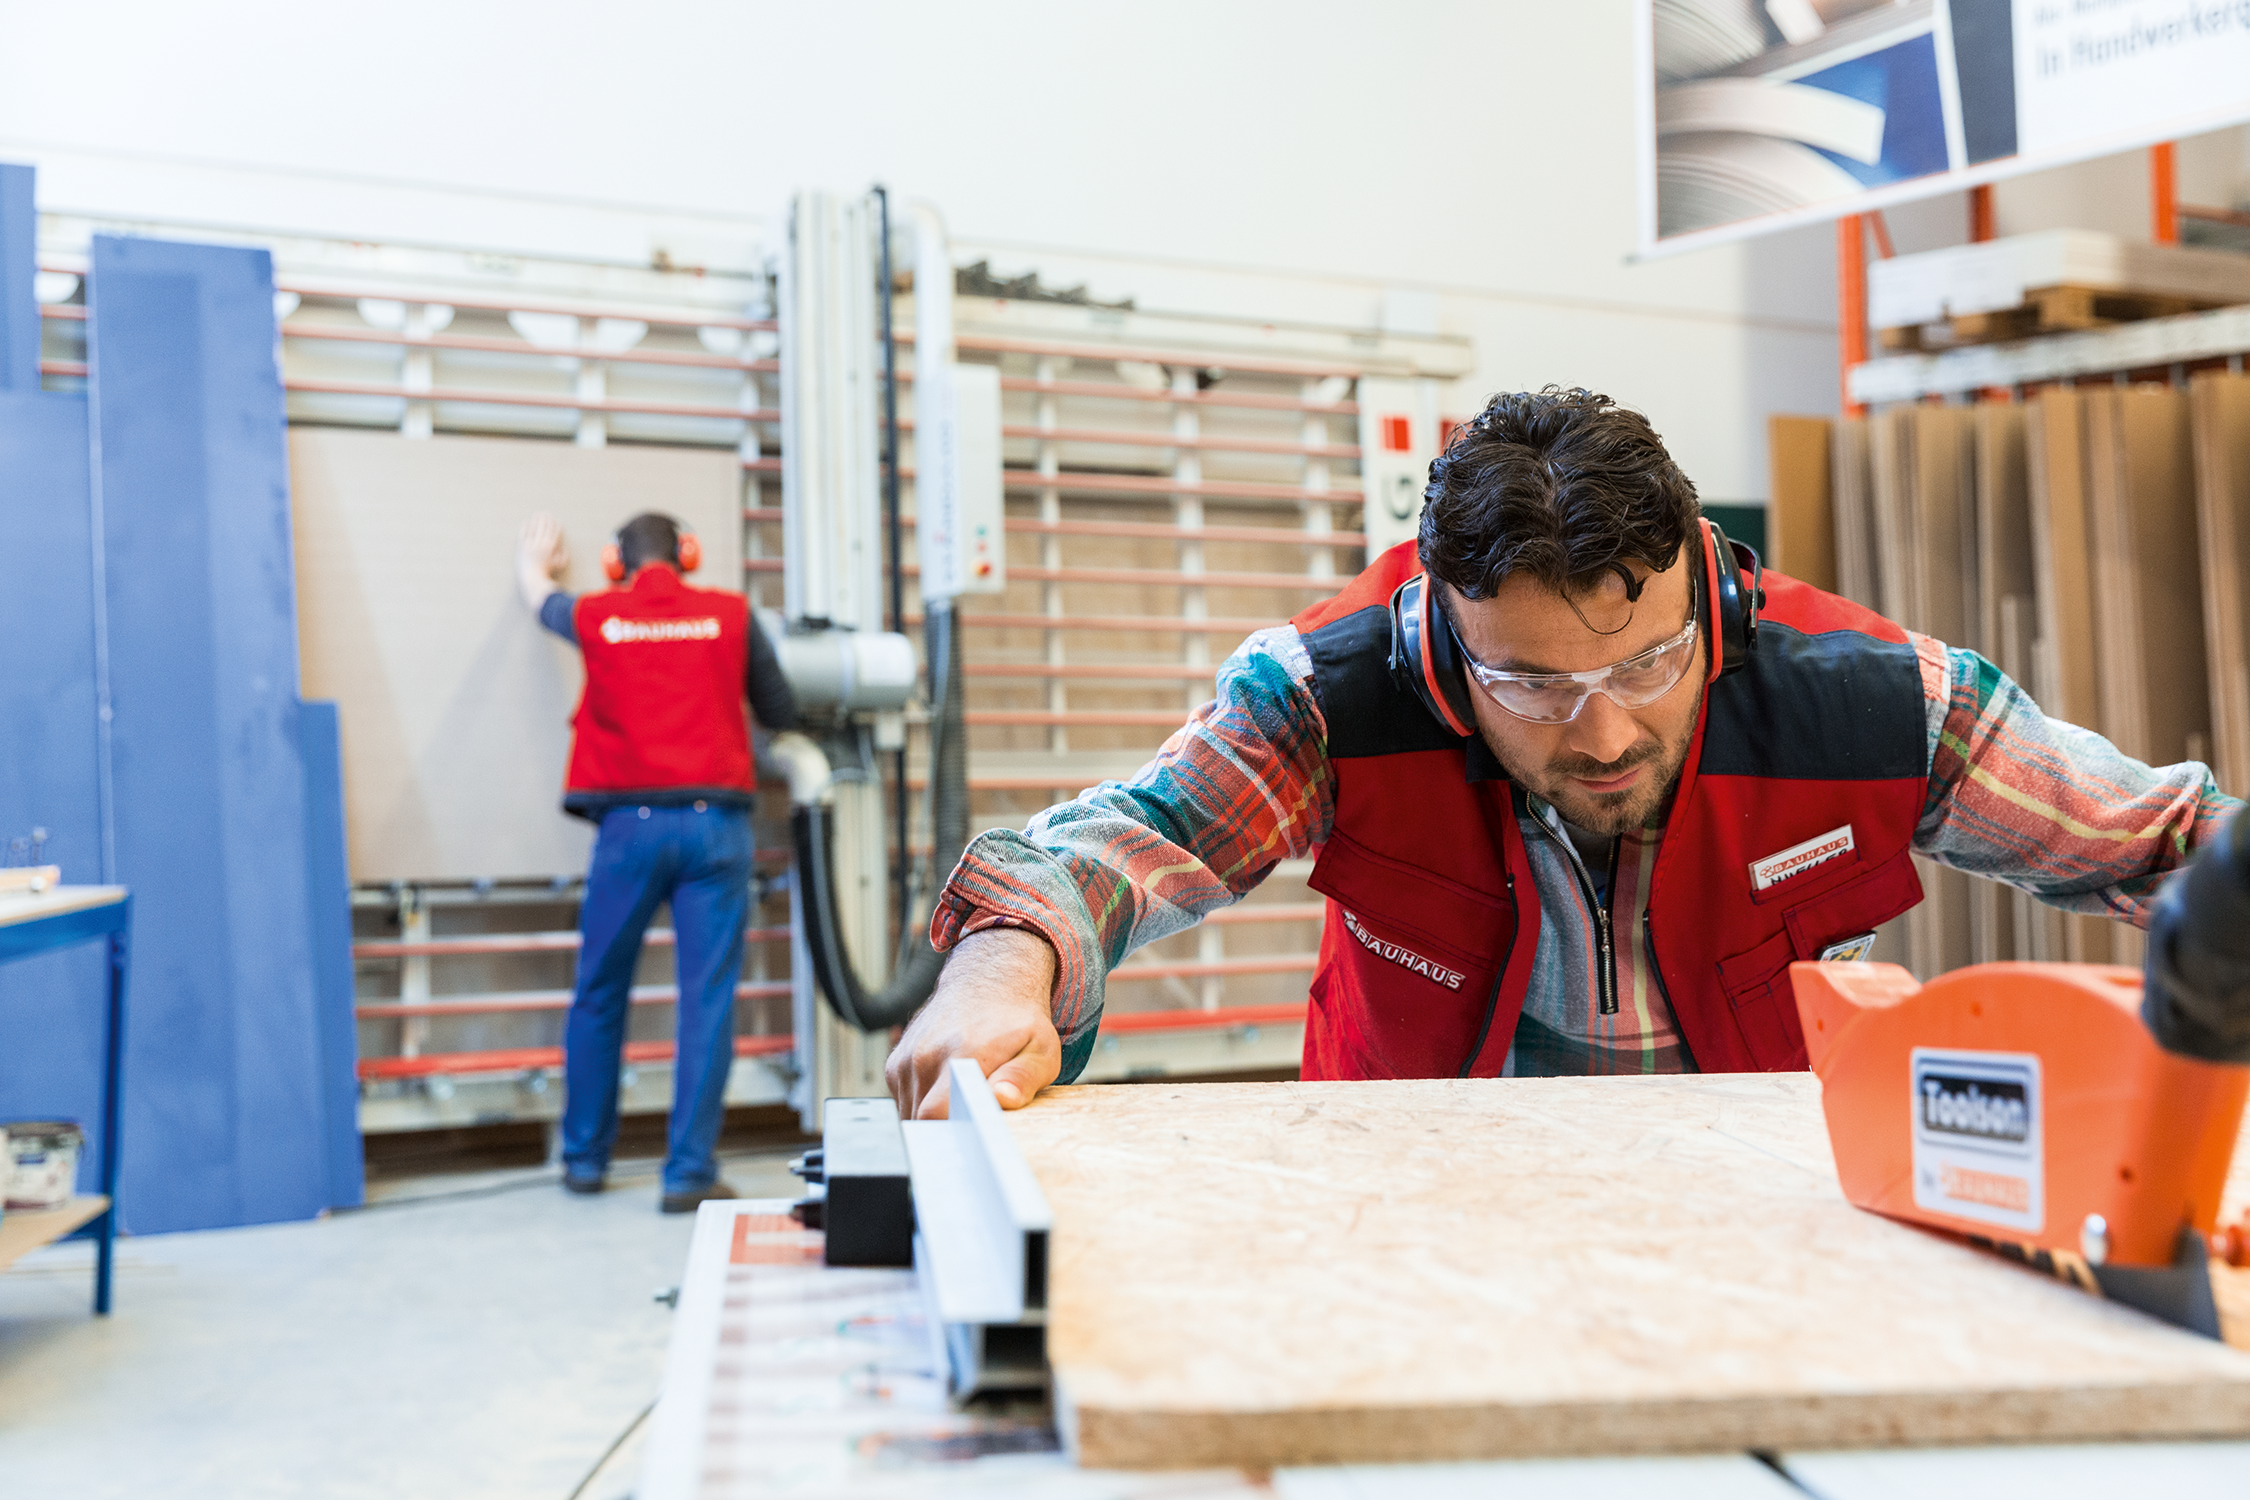 Bauhaus Küchenplatte ~ Perfekt zugeschnitten: holz schneiden die bauhaus fachberater euch